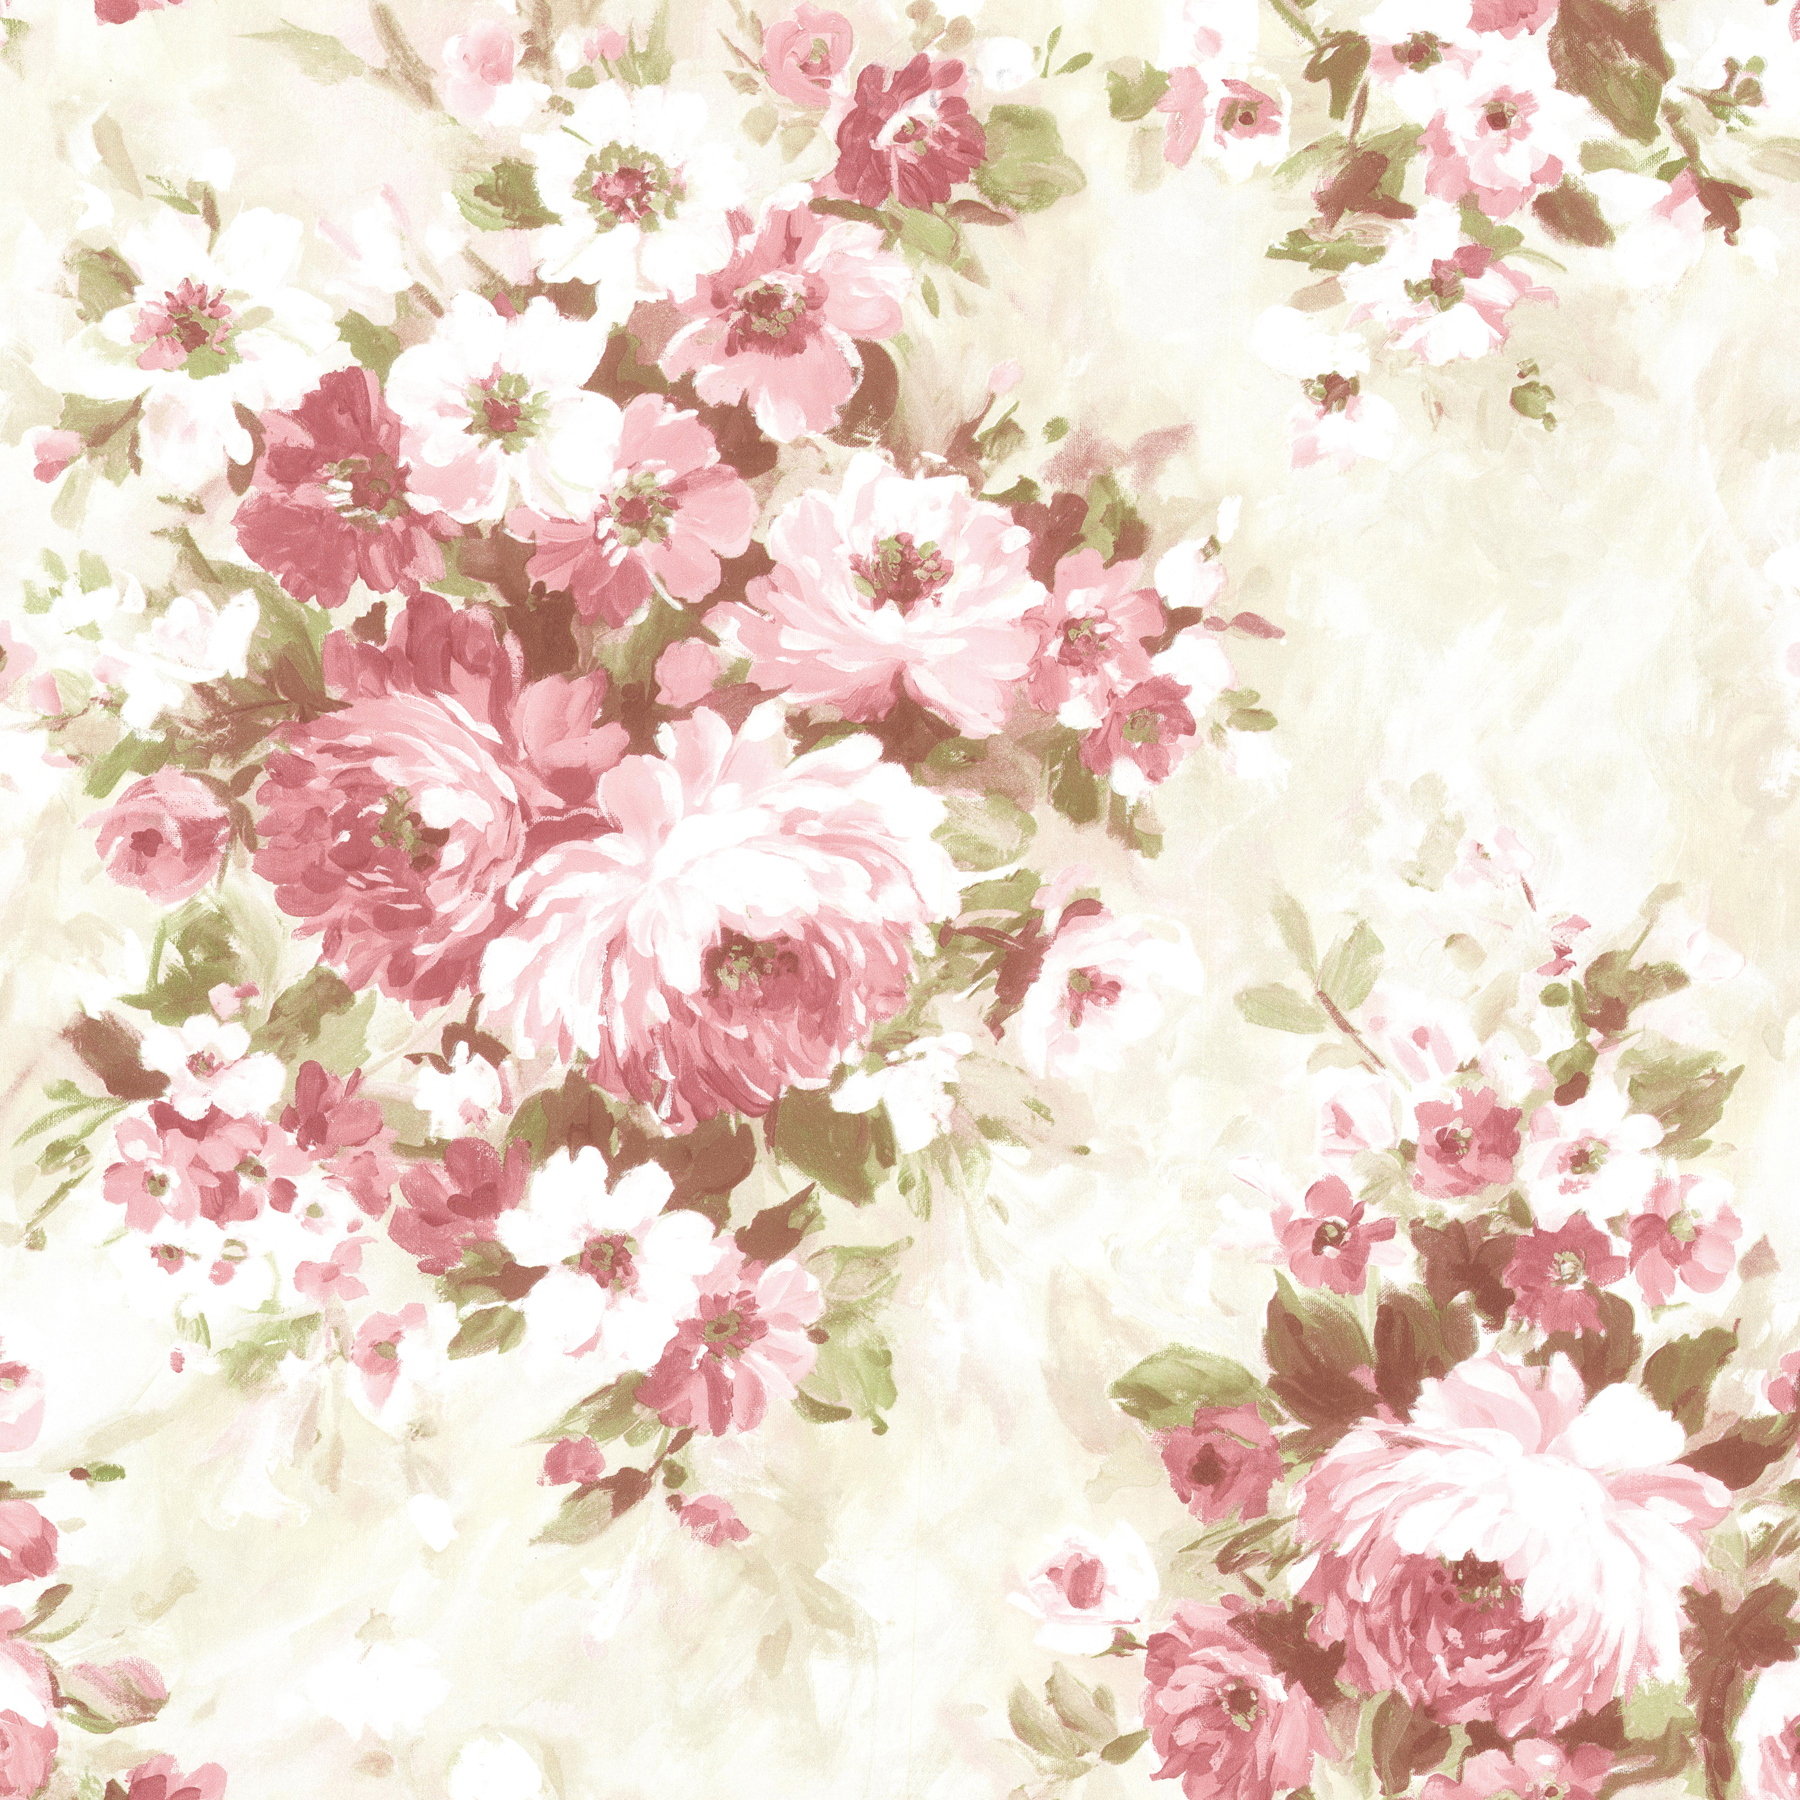 Picture of Belle Rose Floral Bouquet Wallpaper